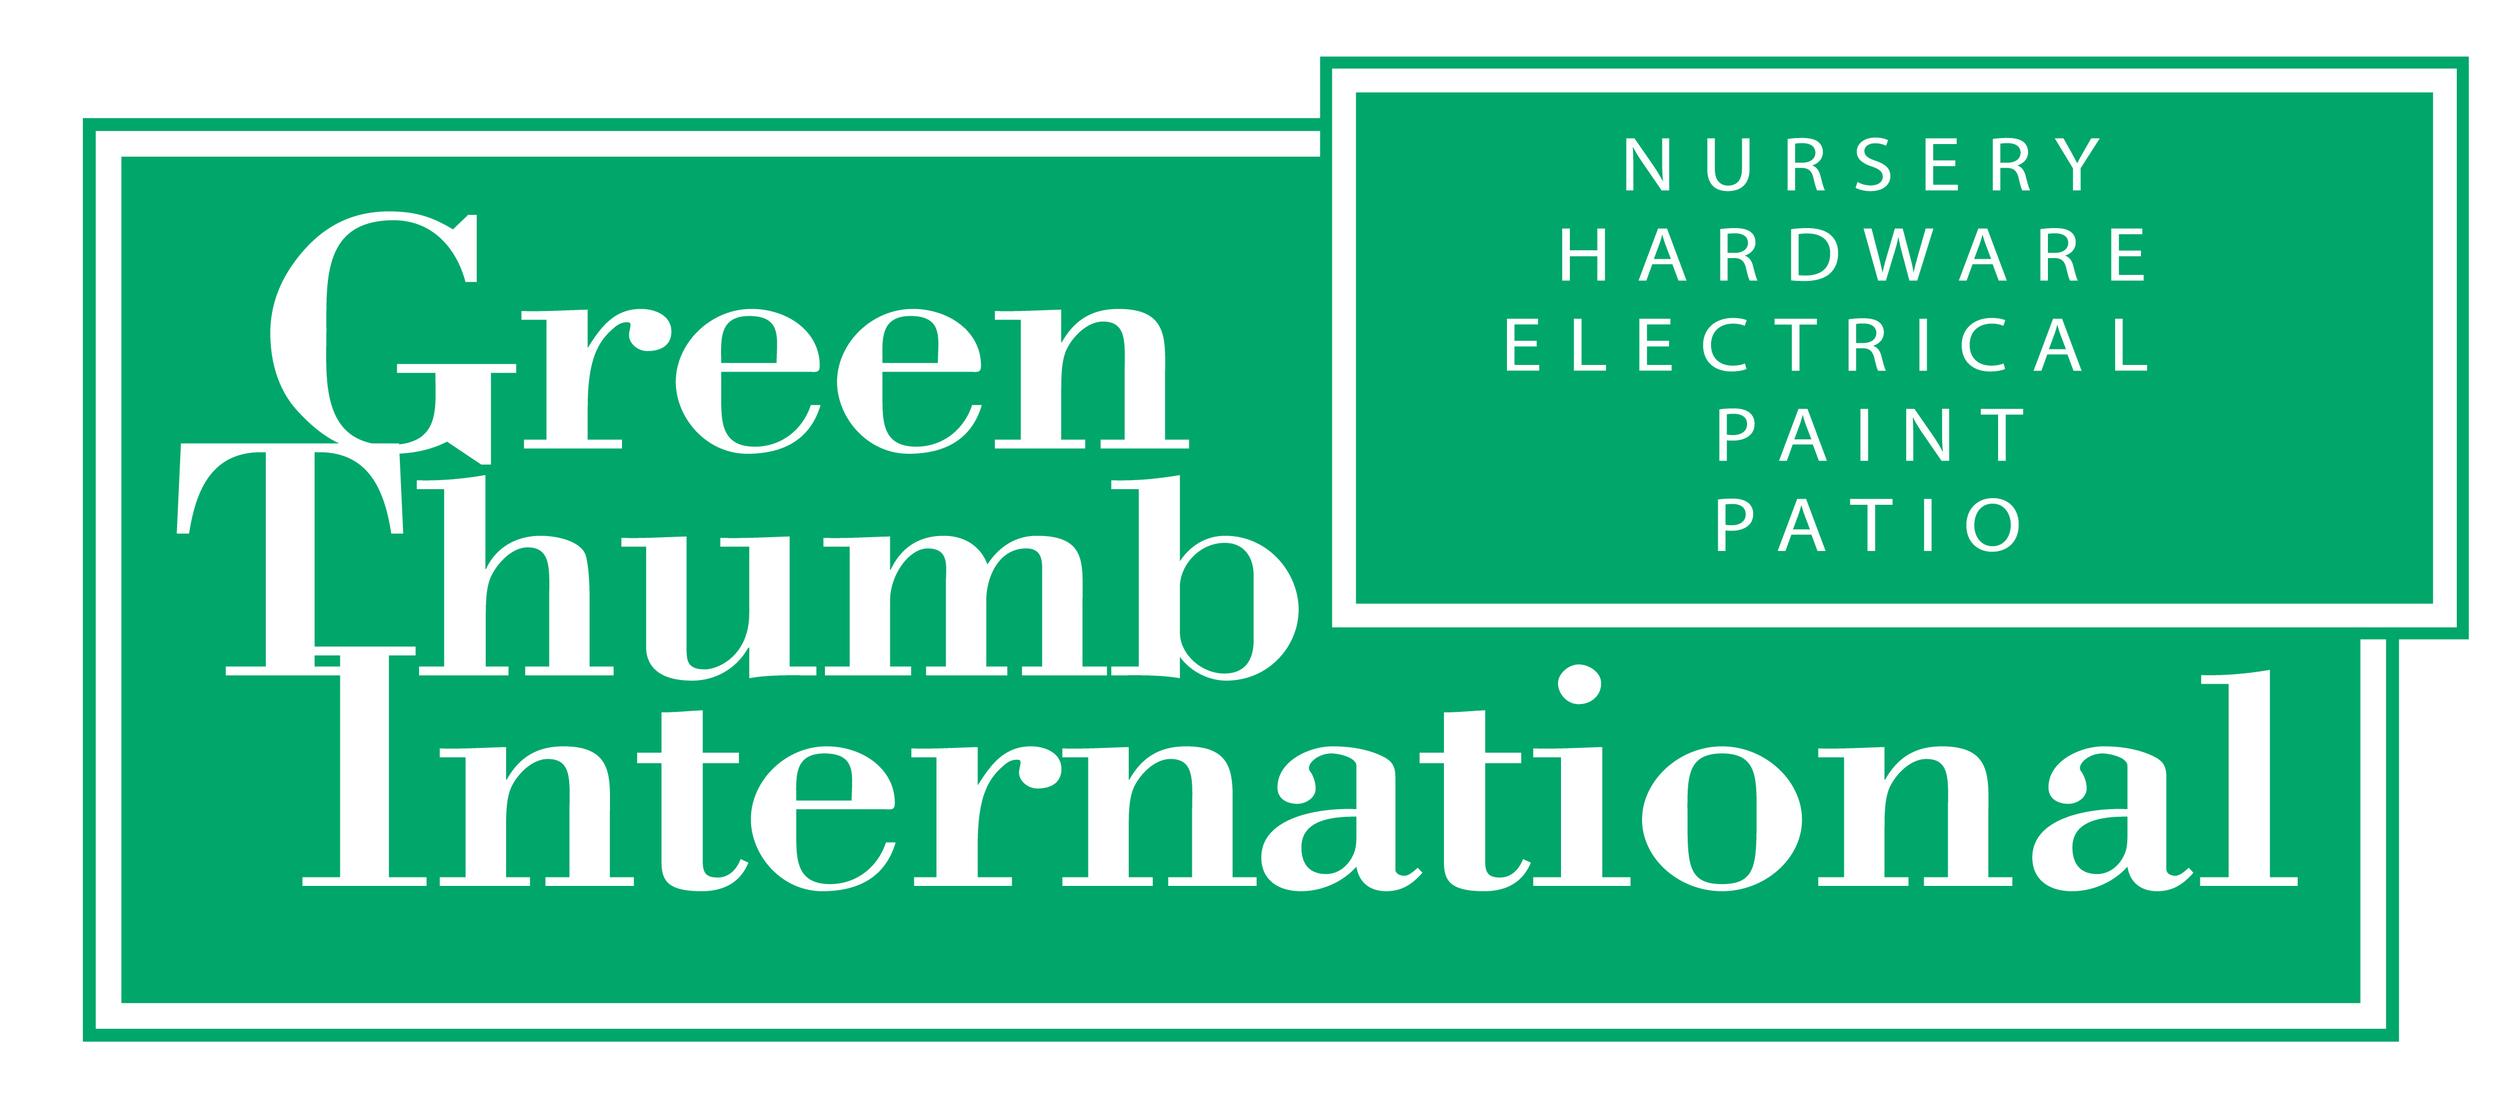 greenthumbint1.jpg